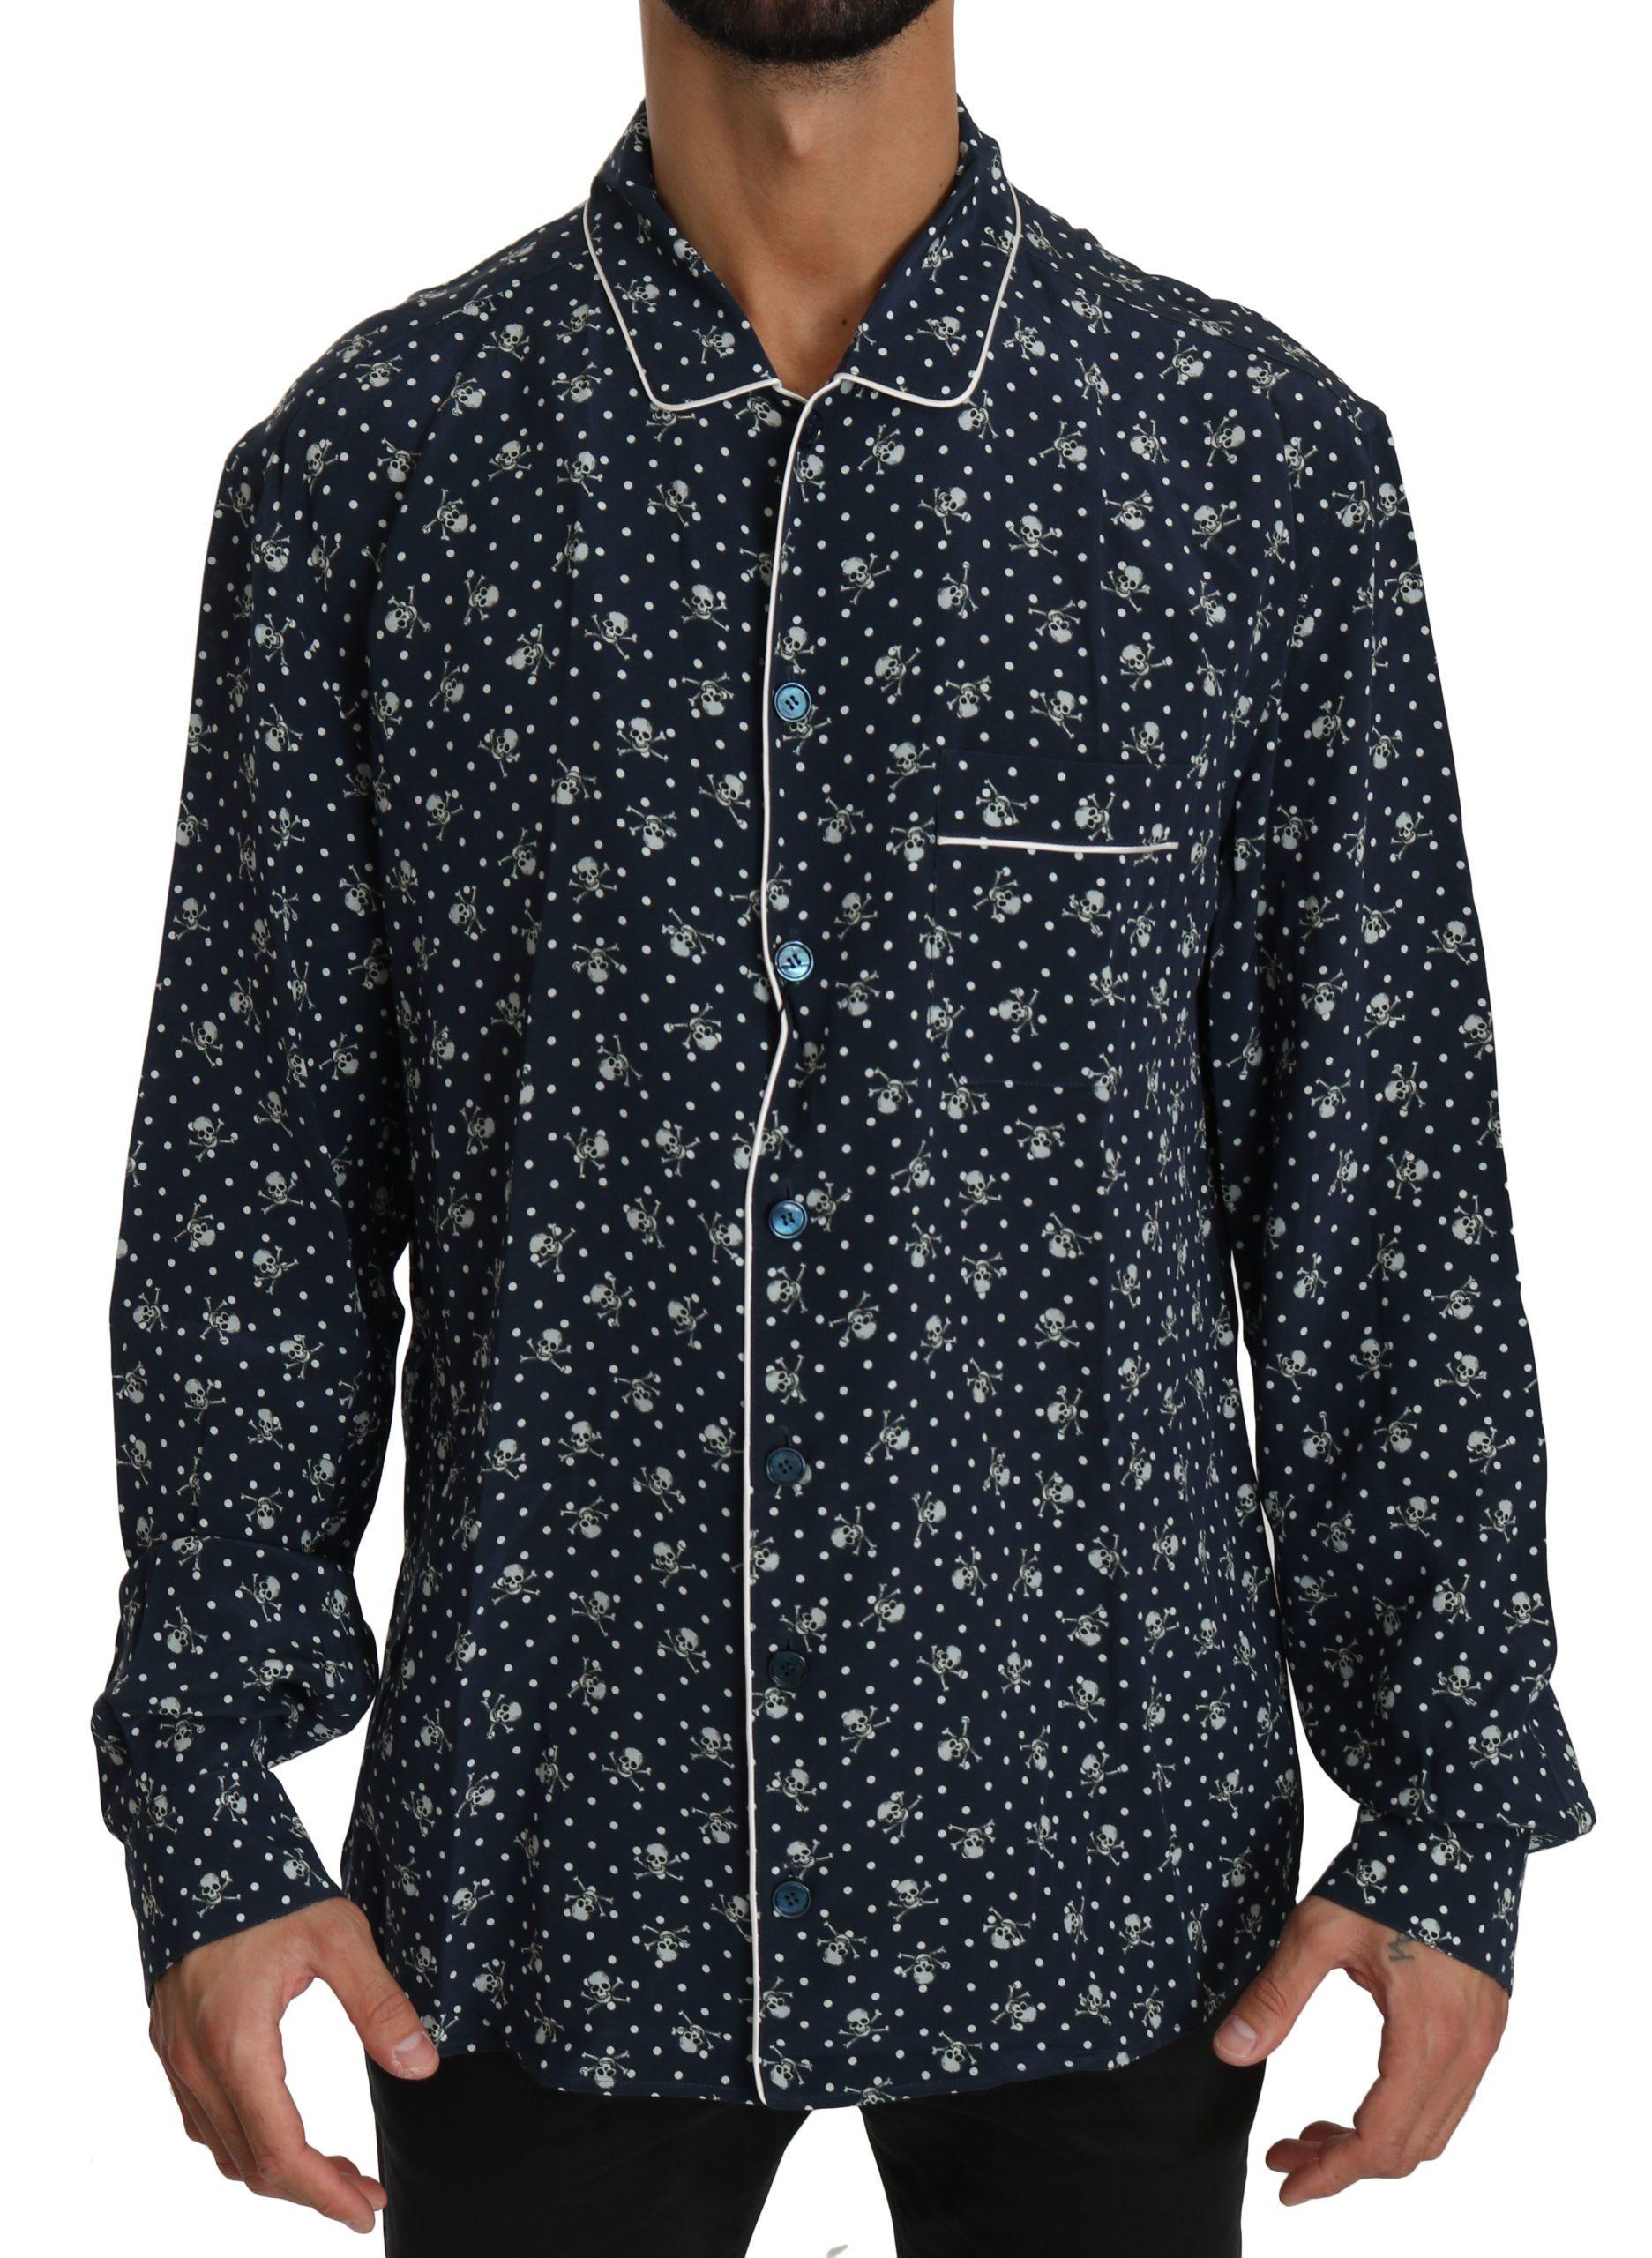 Dolce & Gabbana Men's Skull Print Silk Sleepwear Shirt Blue TSH4014 - IT41   L